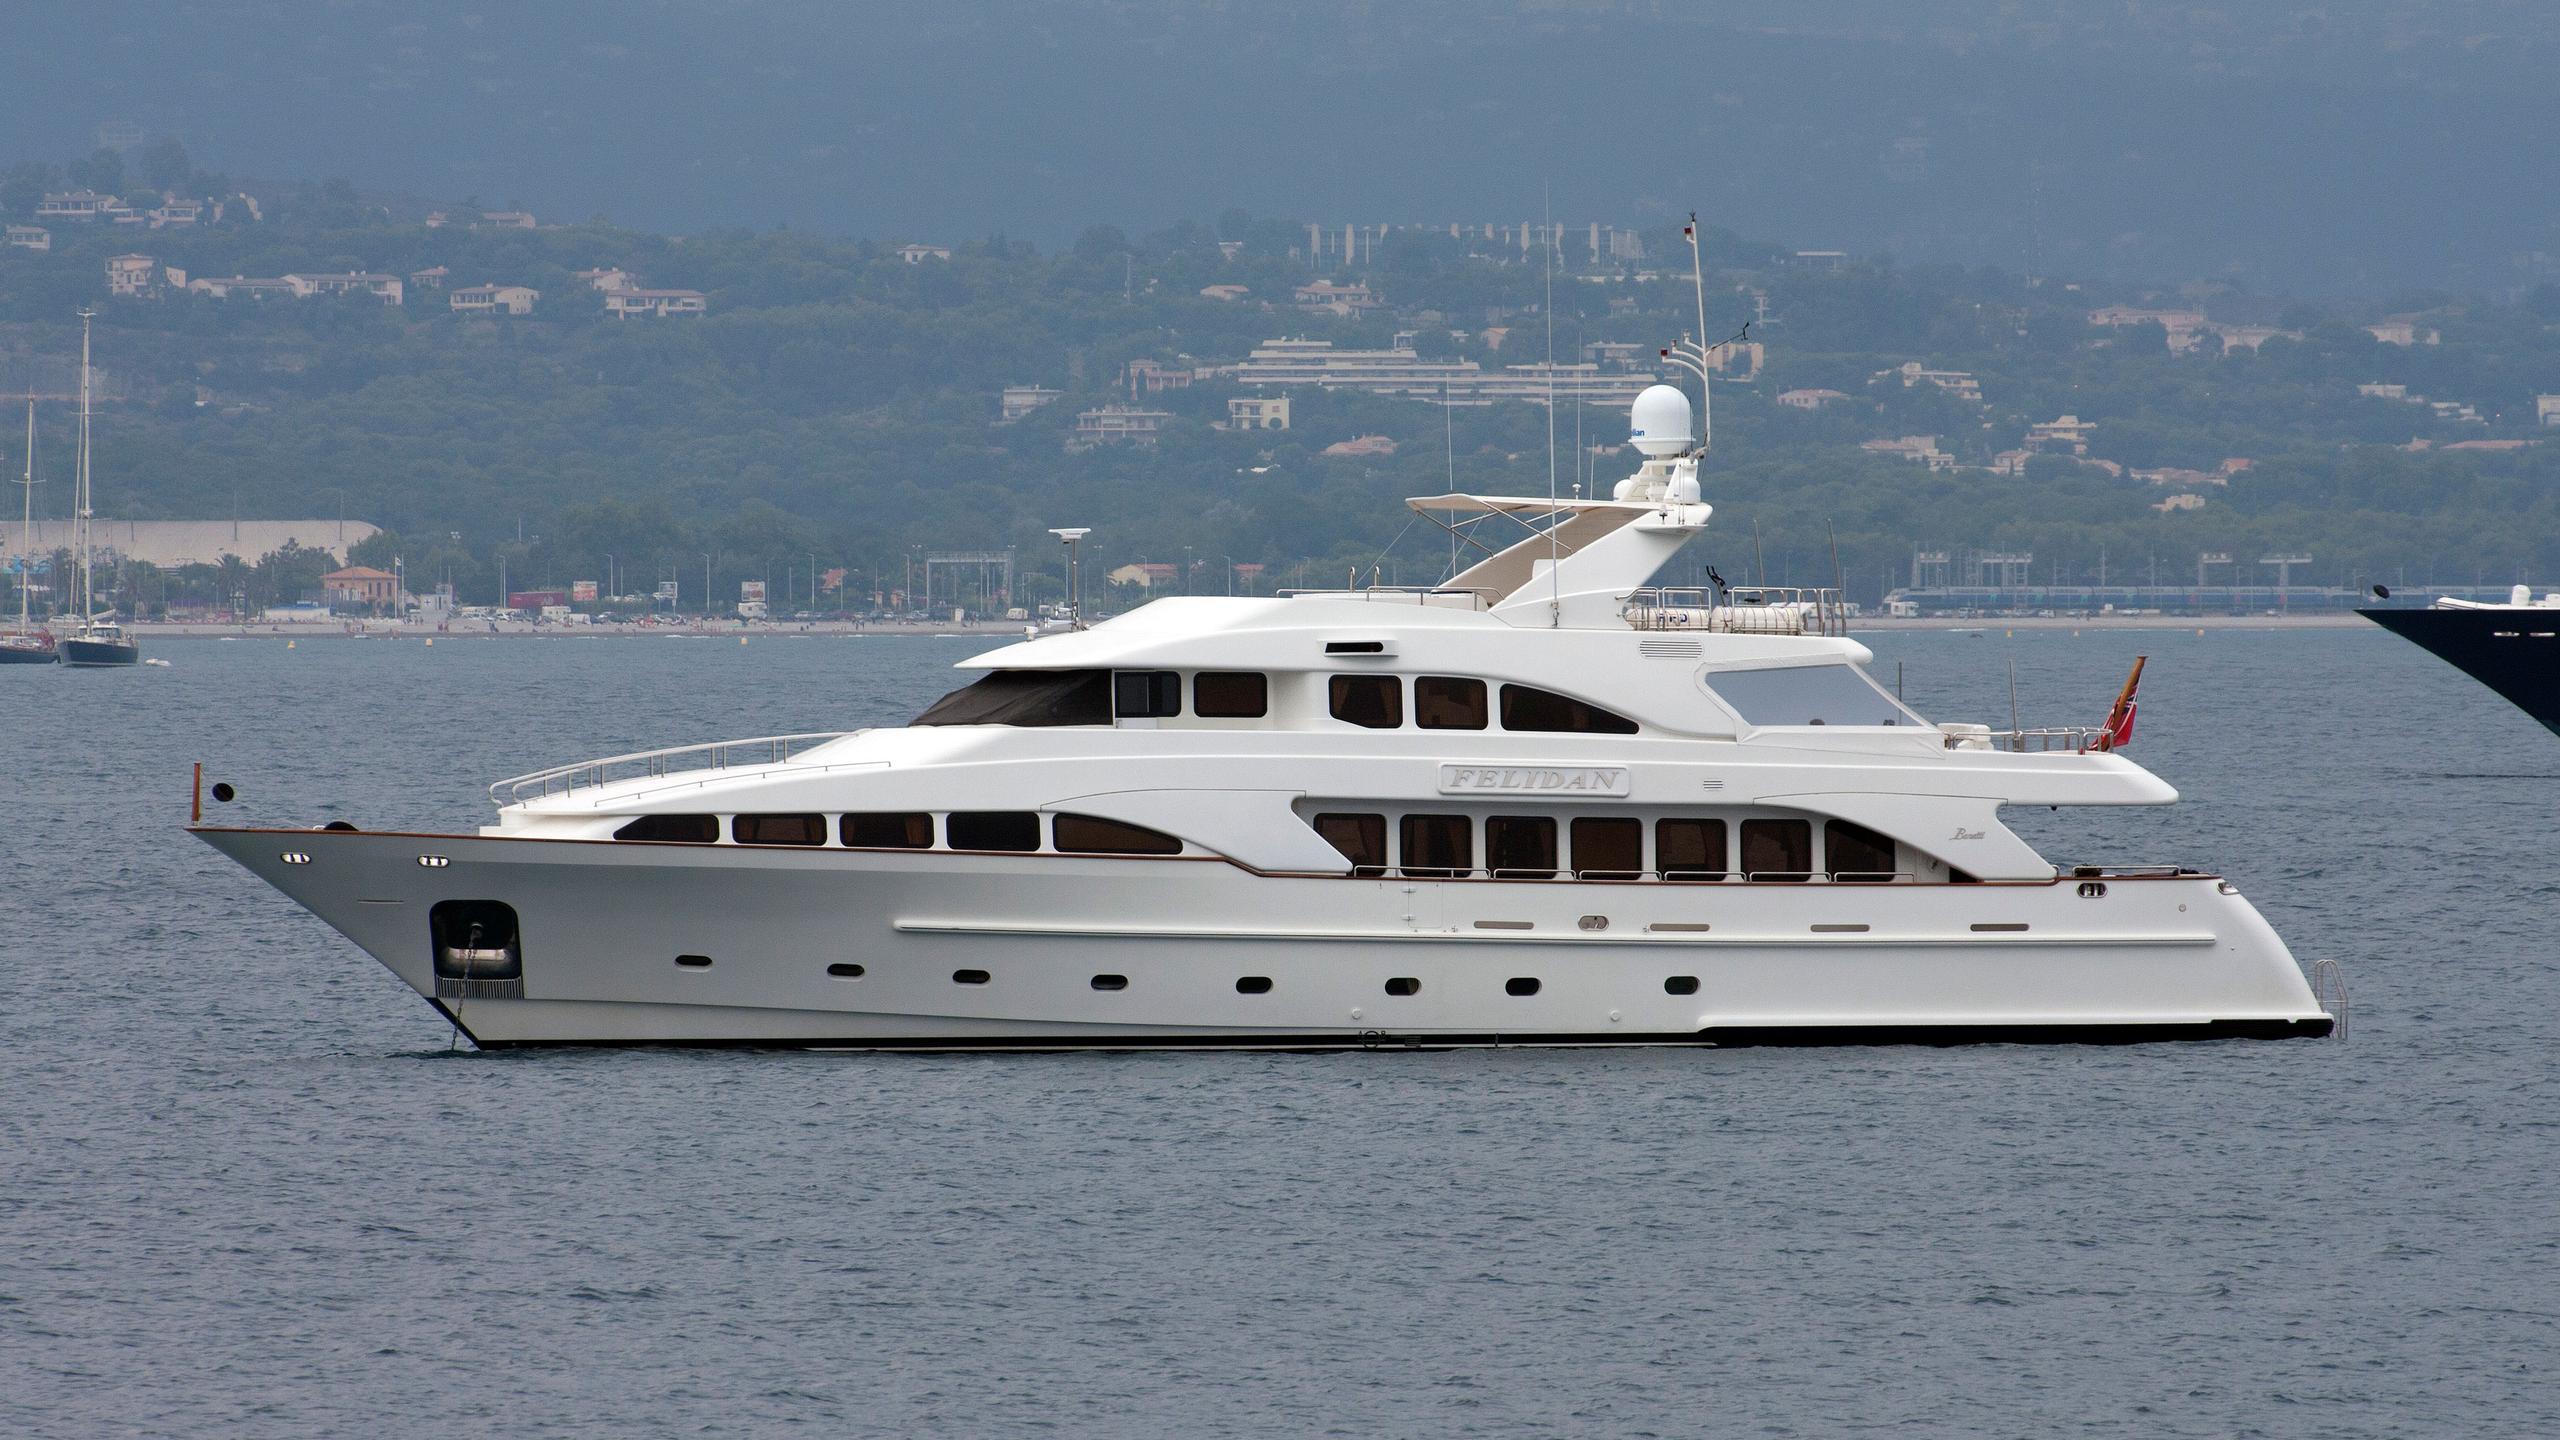 gallus-motor-yacht-benetti-classic-115-1999-35m-moored-profile